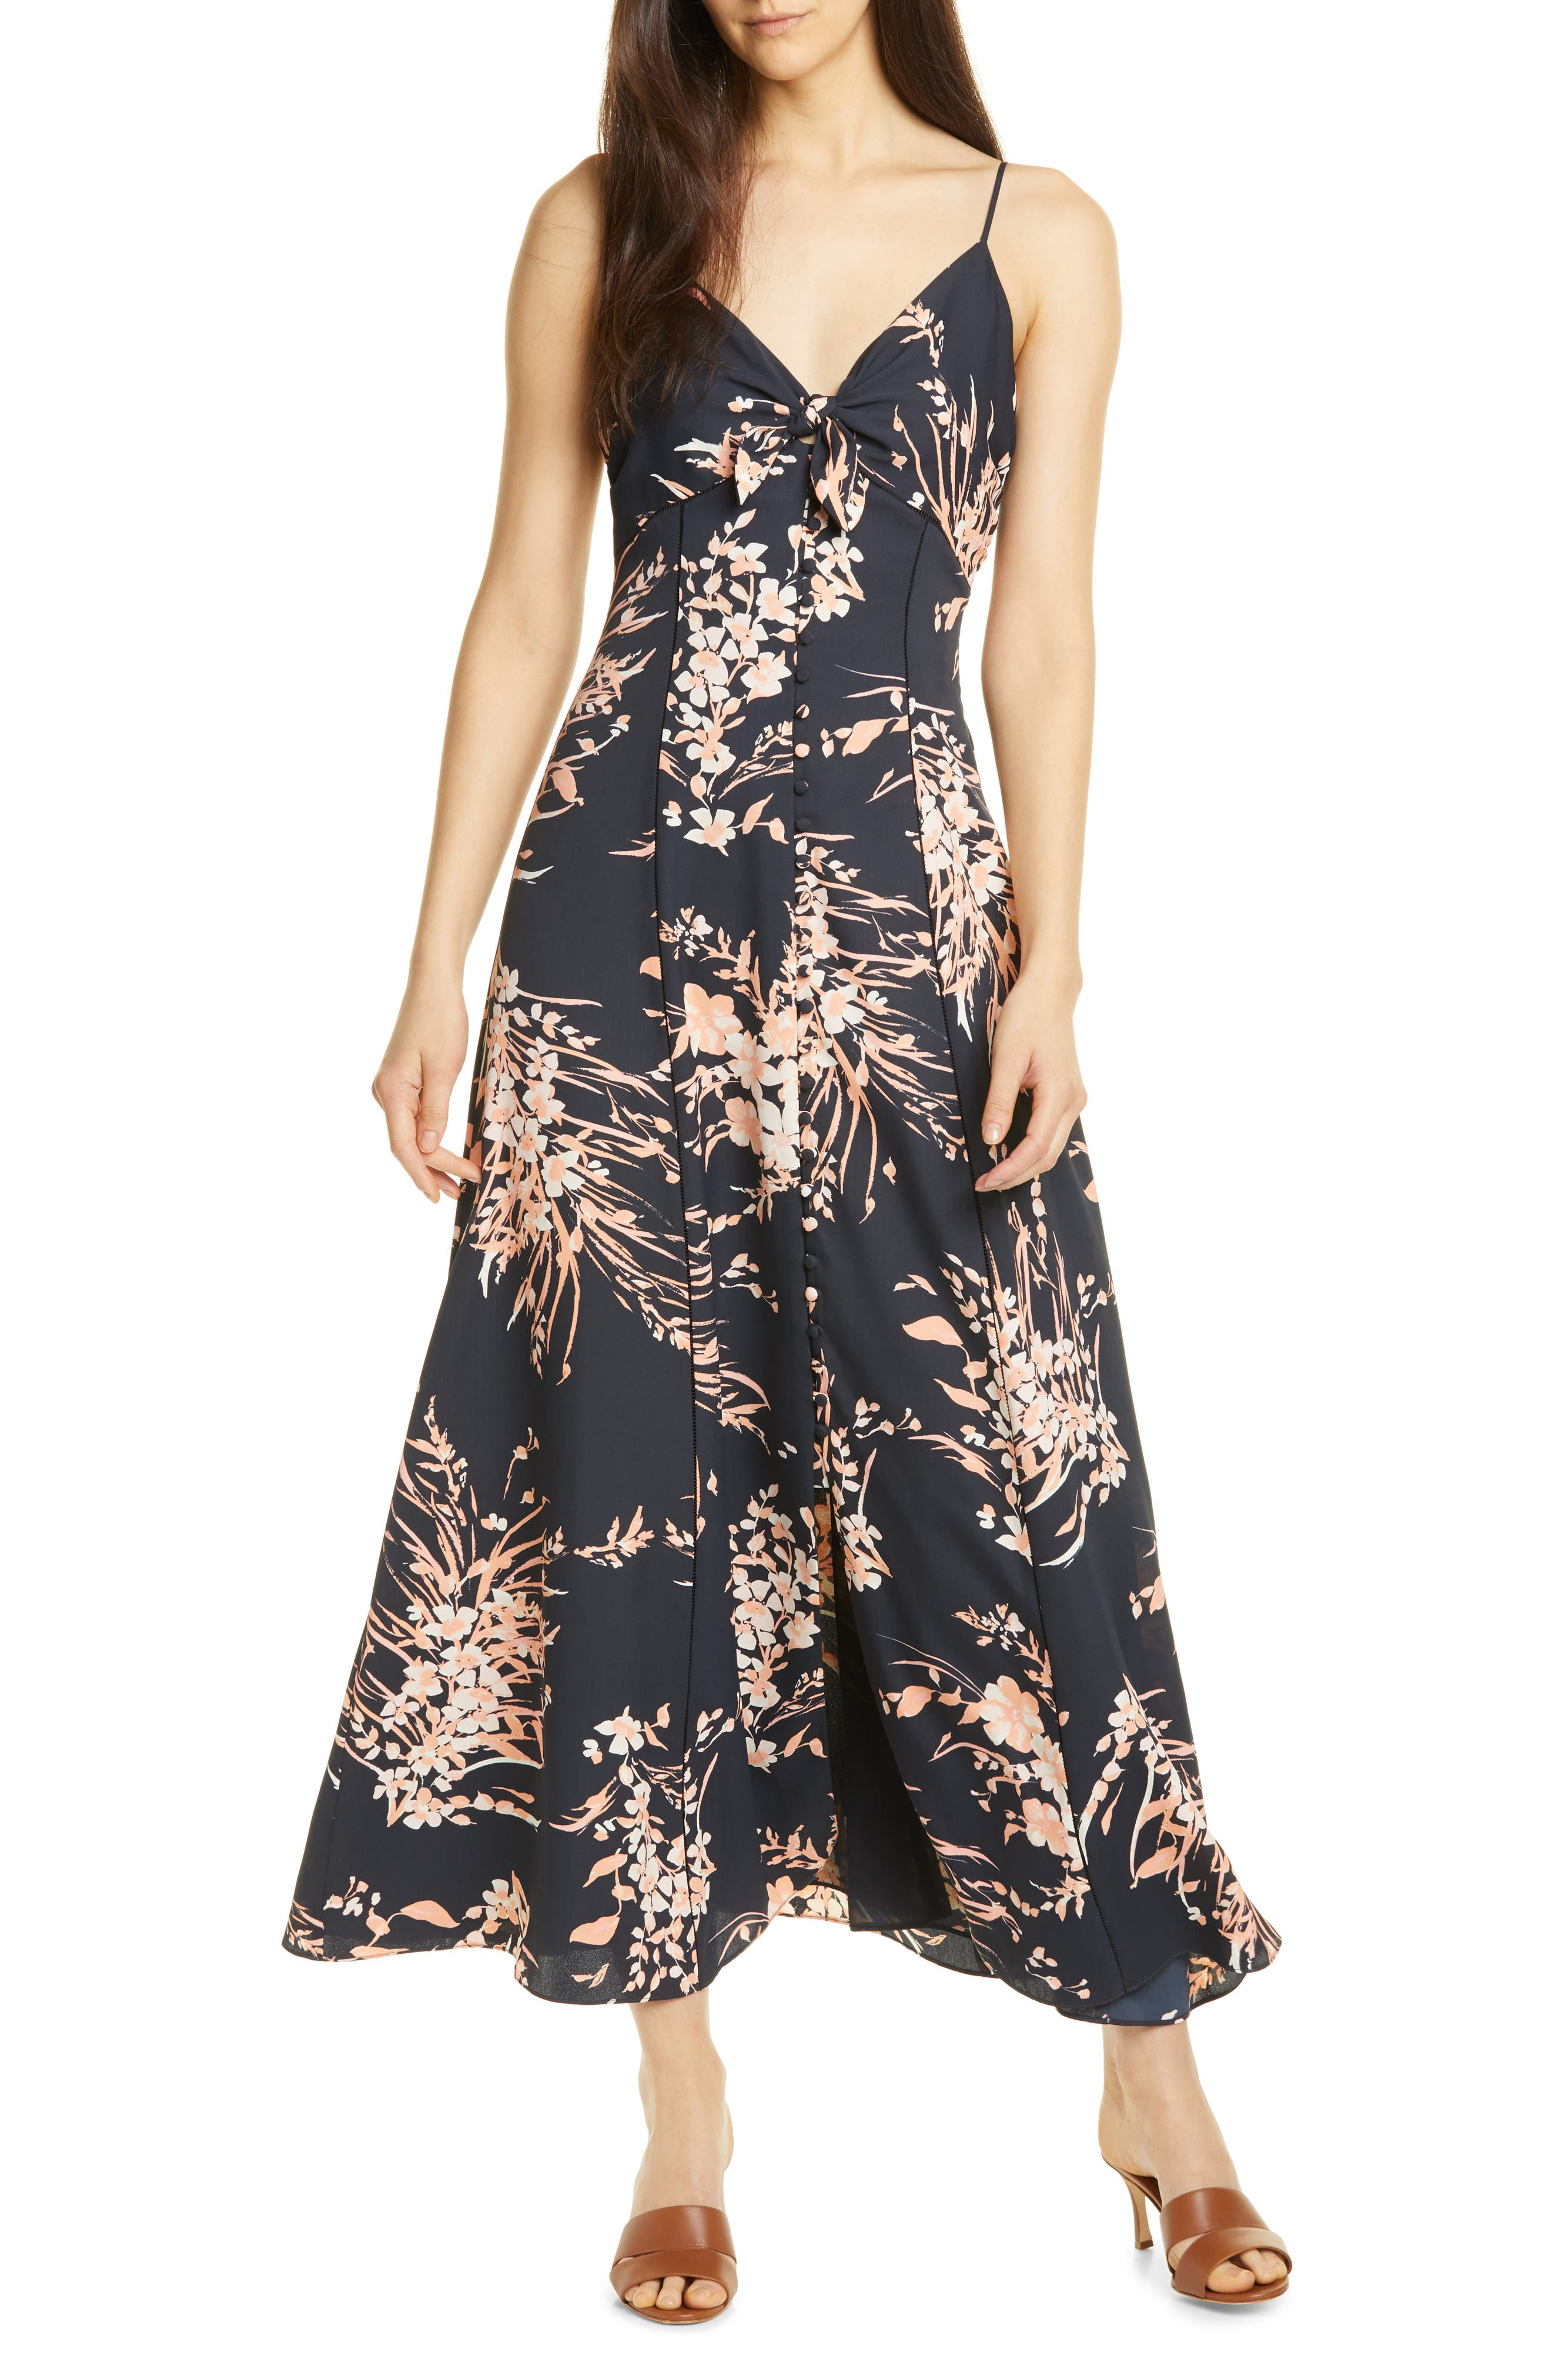 Joie Almona Floral Print Button Front Maxi Dress, Black